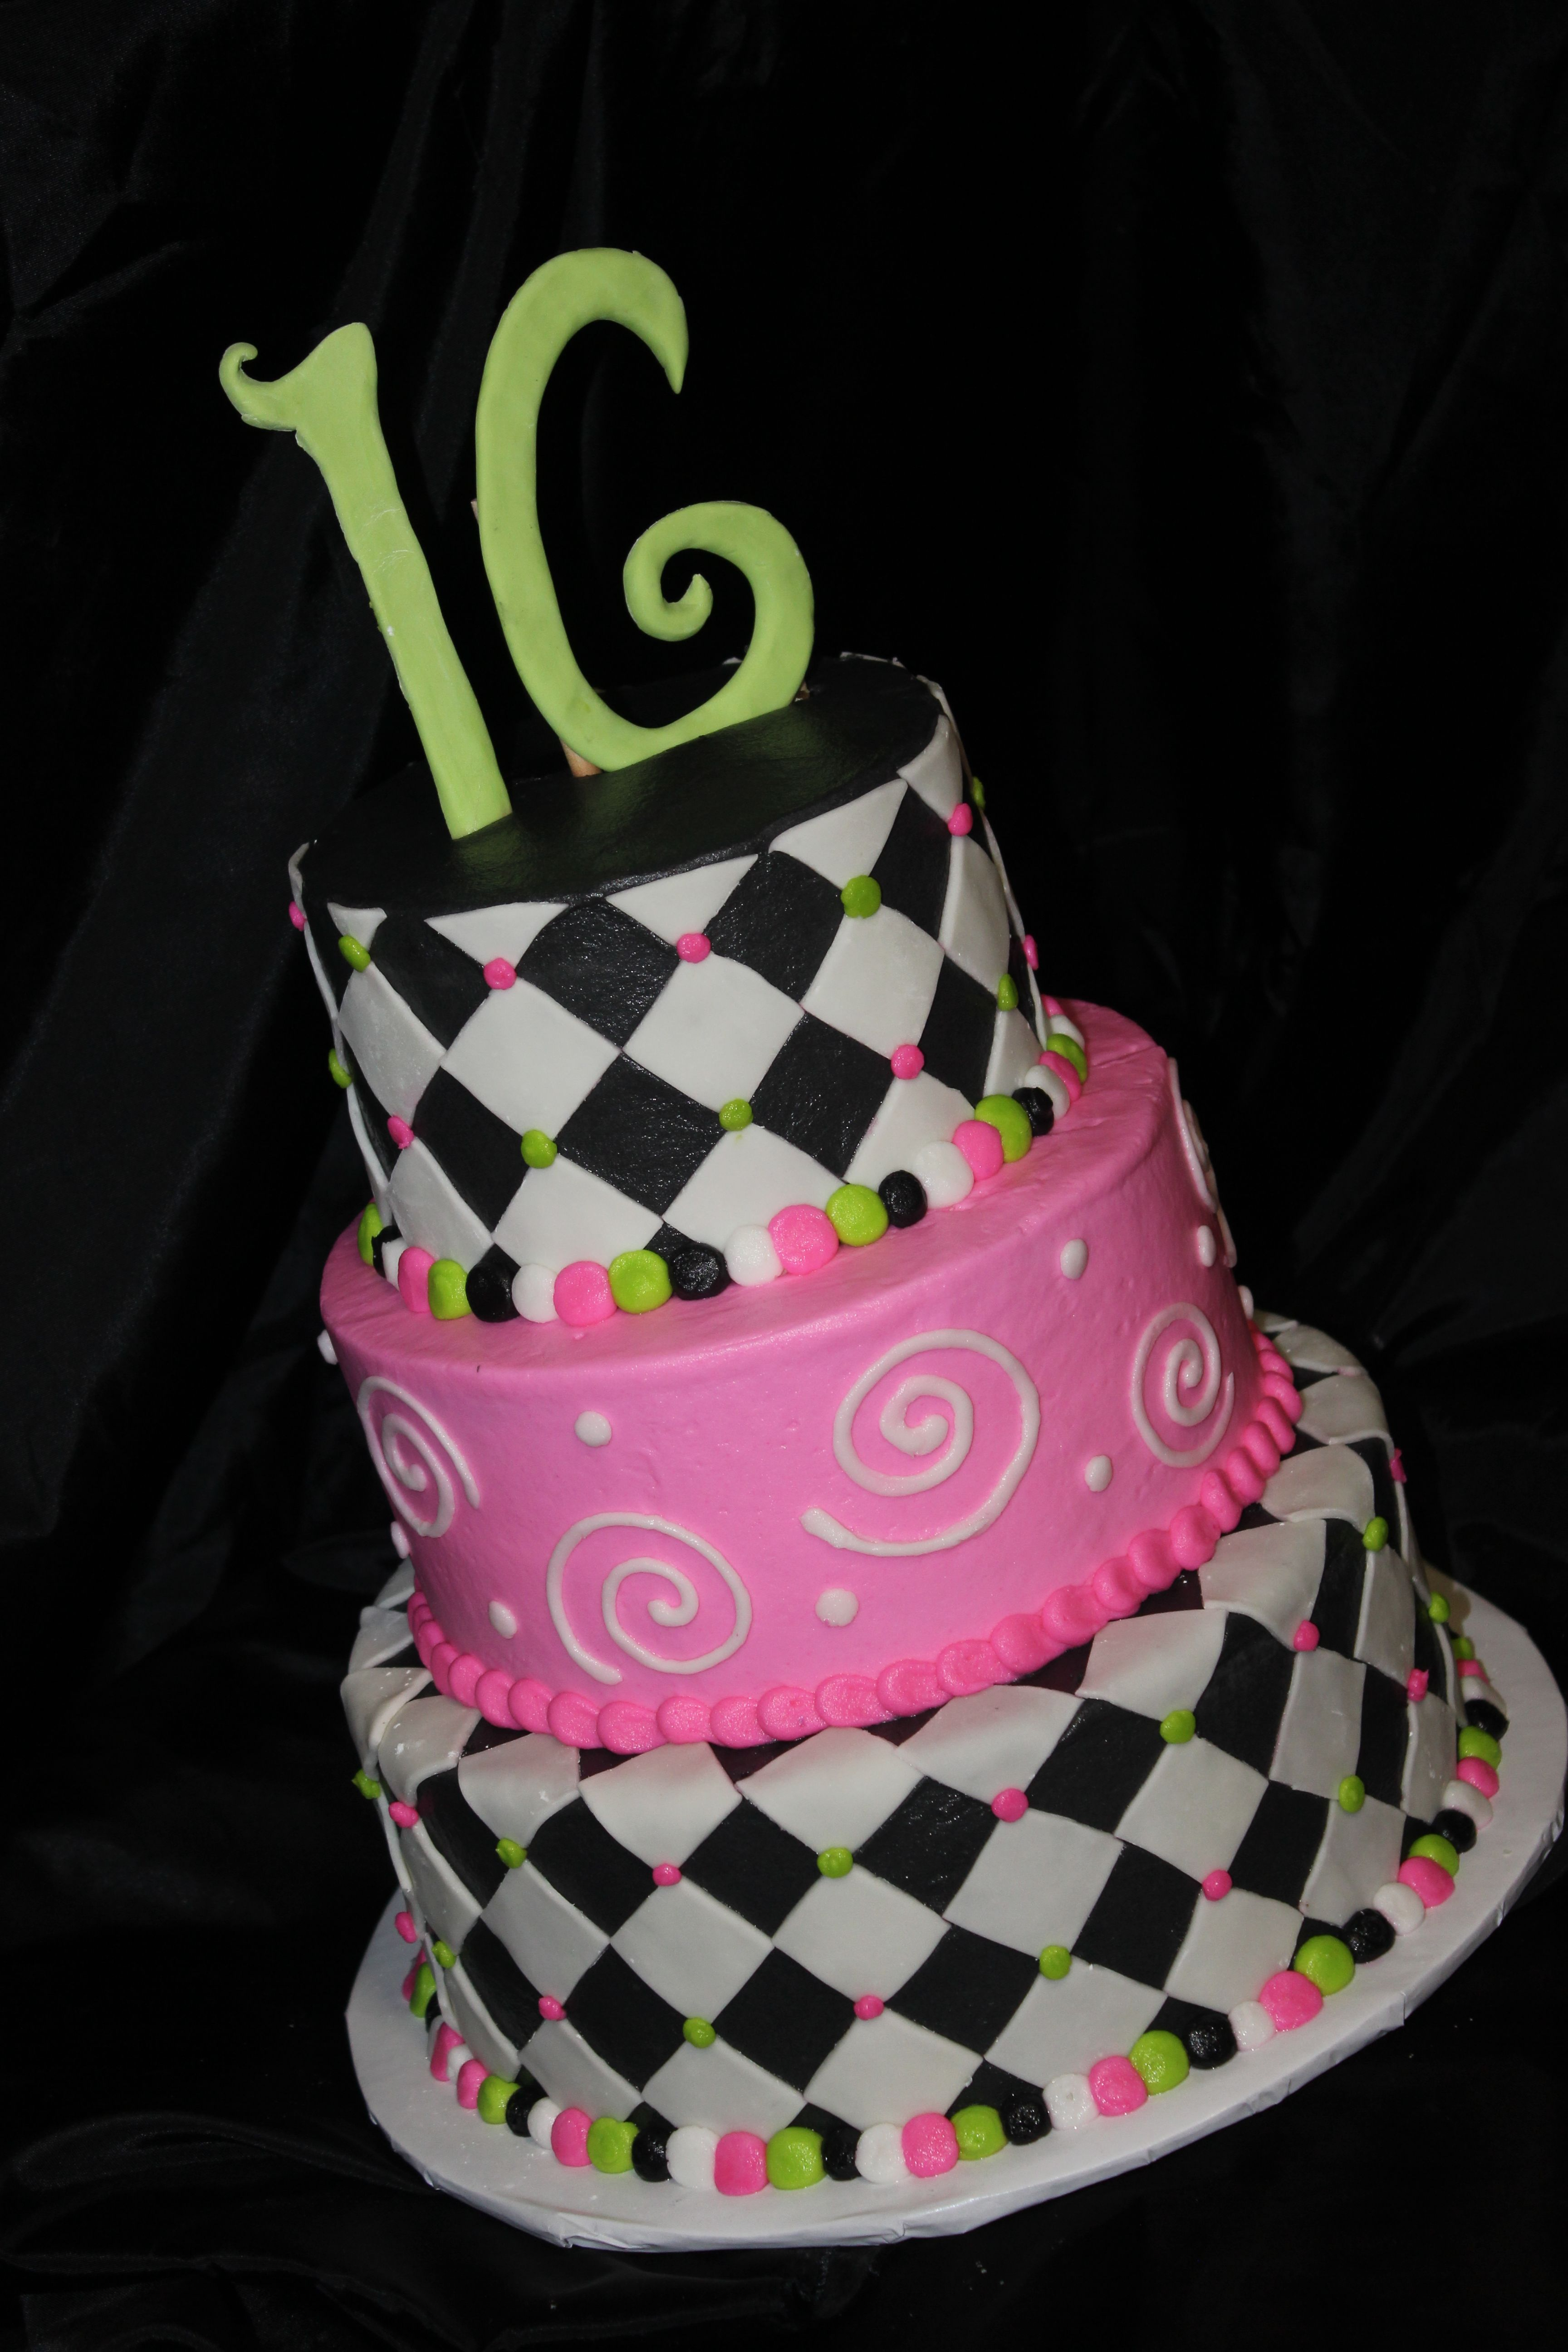 16th birthday cake for girl cakes pinterest birthday